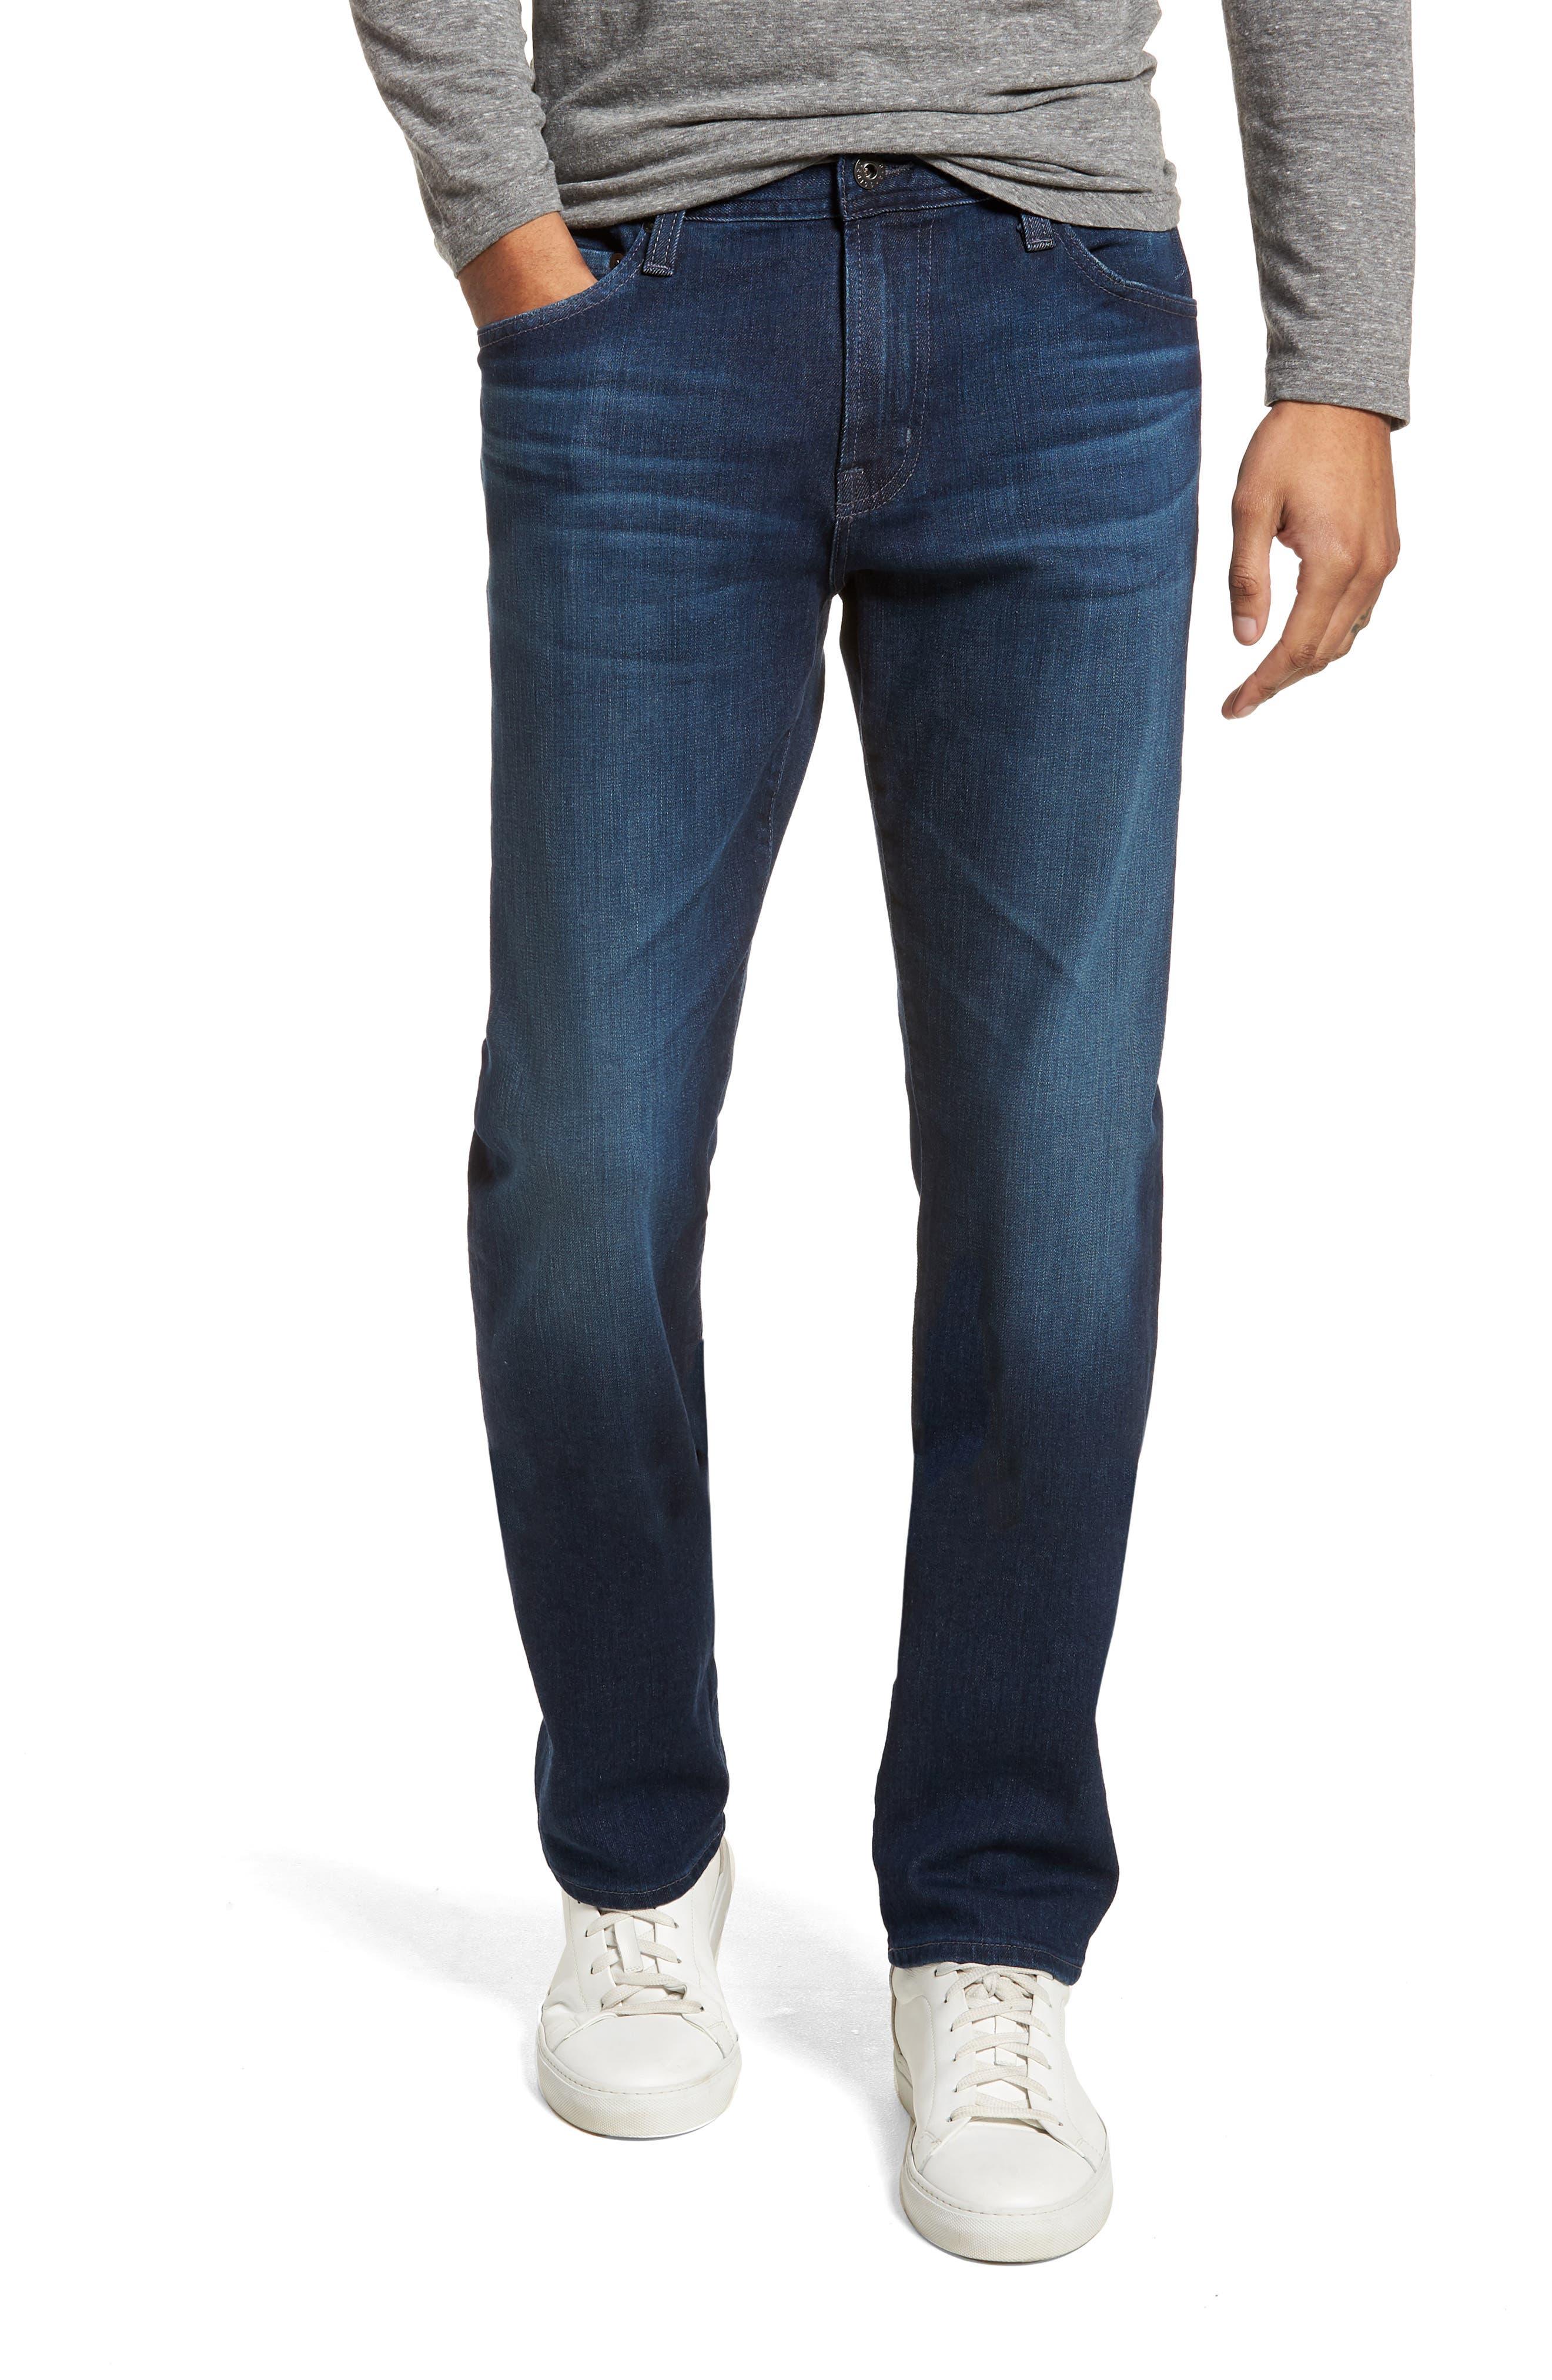 Everett Slim Straight Leg Jeans,                             Main thumbnail 1, color,                             Cross Creek